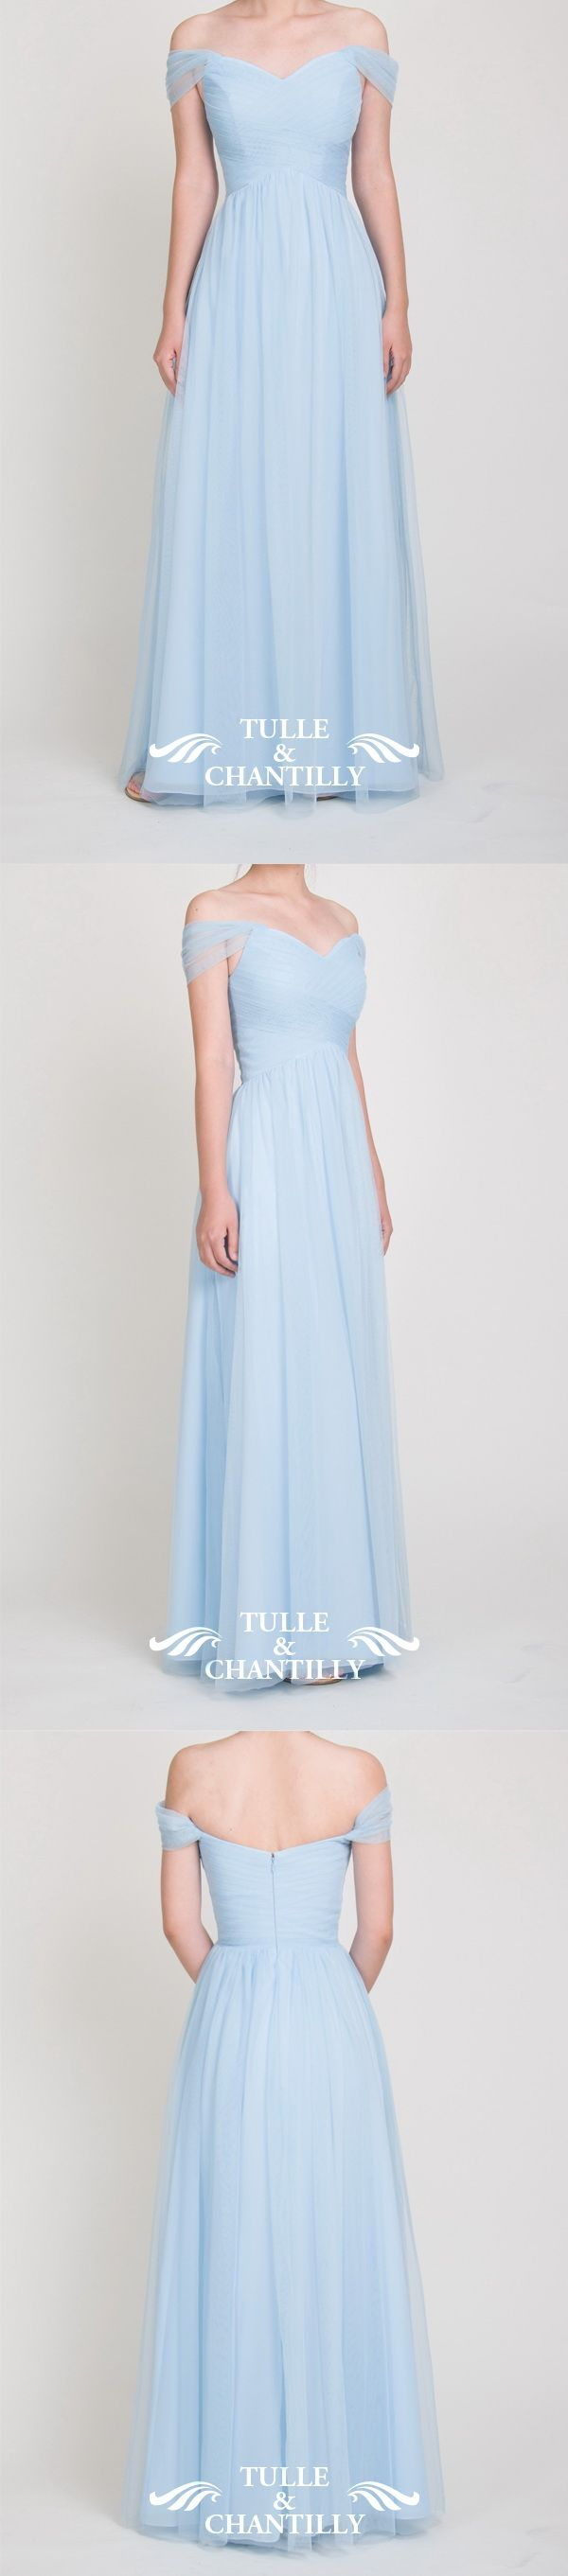 Long off shoulder tulle bridesmaid dress tbqp328 shoulder light sky blue off shoulder tulle bridesmaid dresses long ombrellifo Images